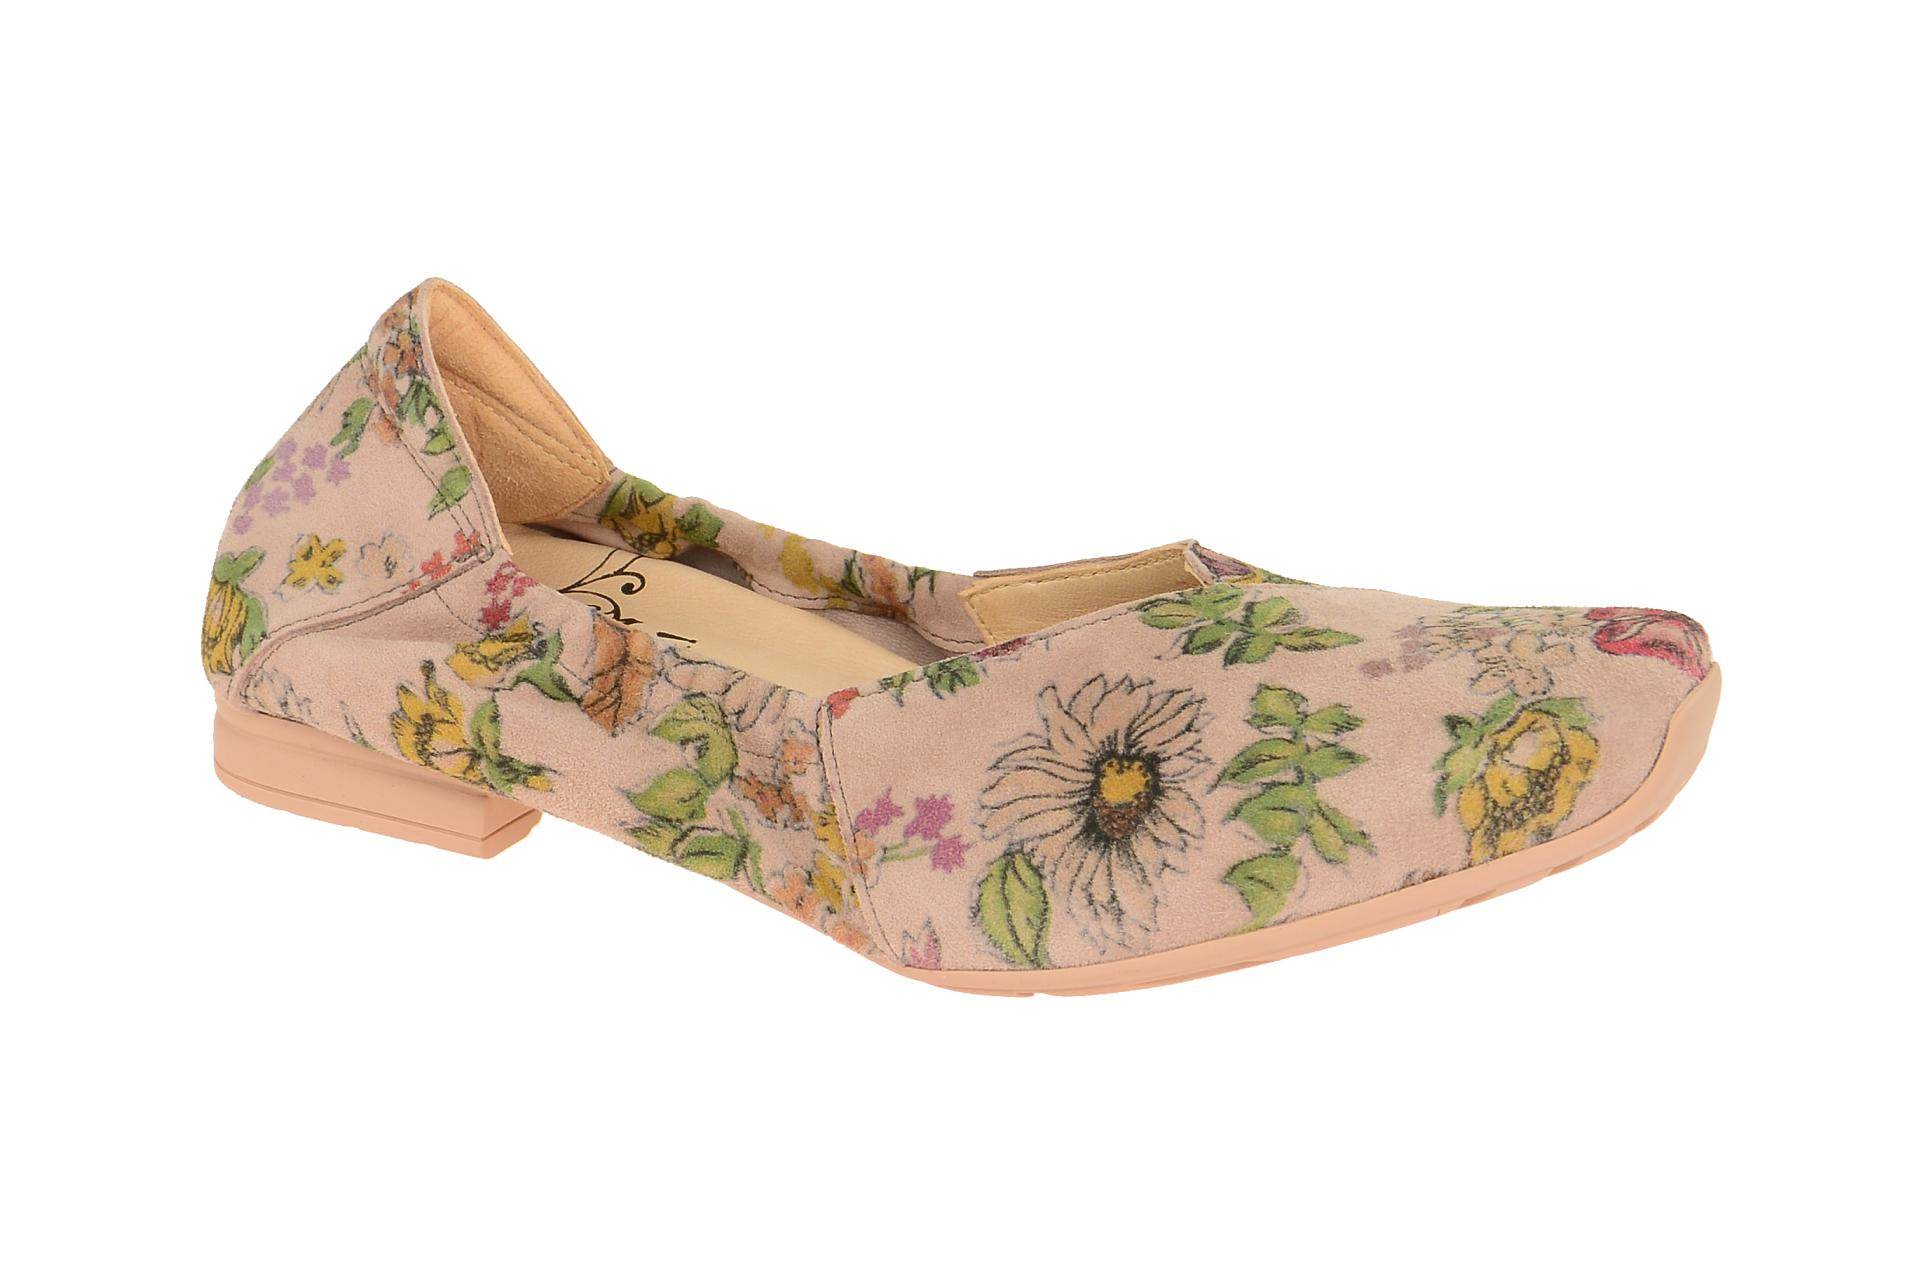 think schuhe gaudi pink ballerinas damen halbschuhe 2 82172 35 neu ebay. Black Bedroom Furniture Sets. Home Design Ideas